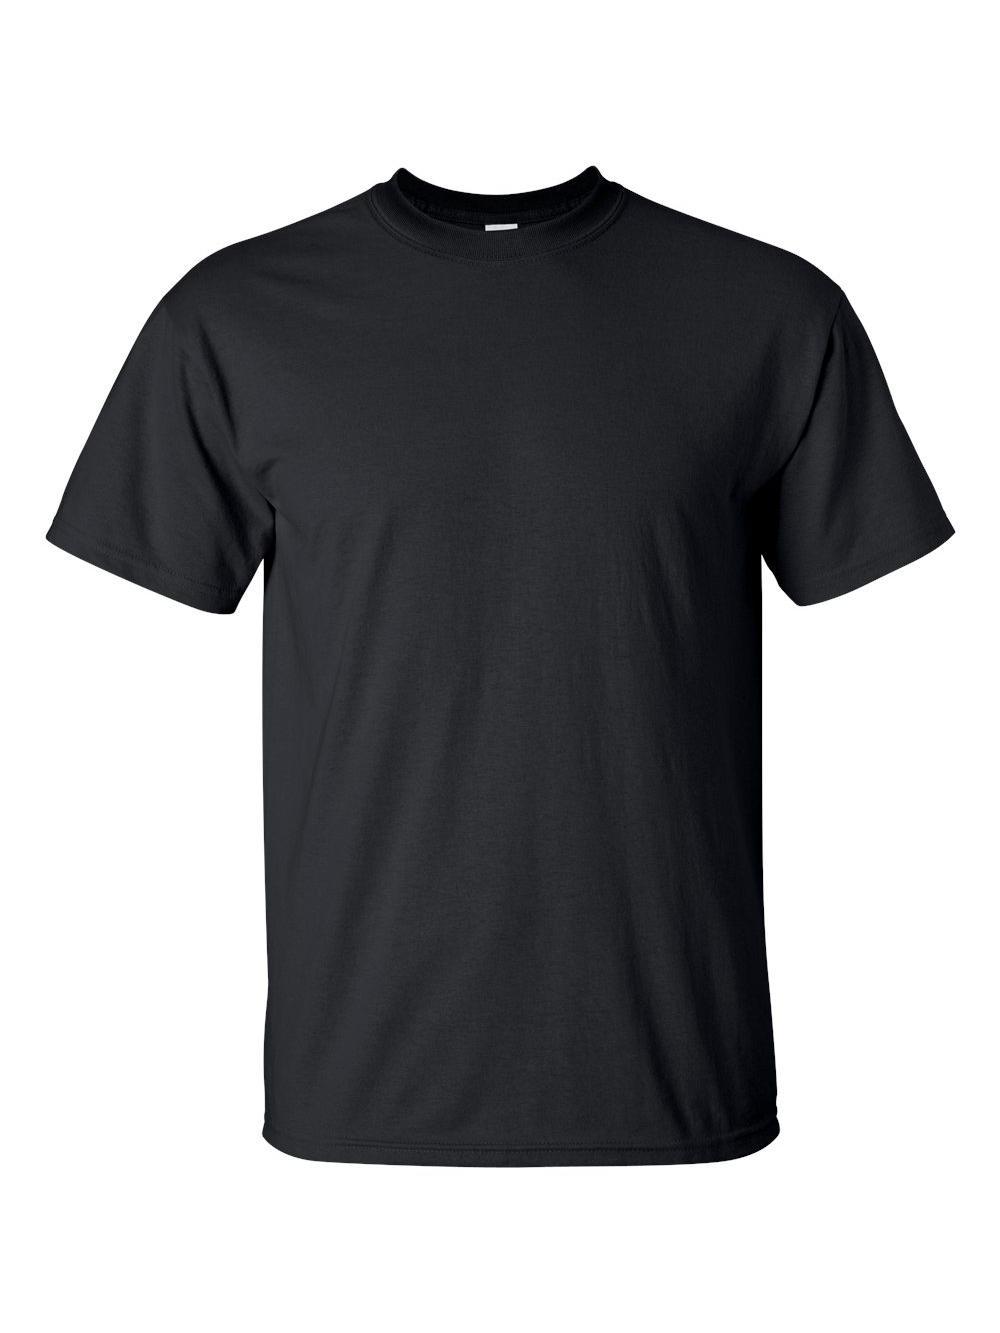 Gildan-Ultra-Cotton-T-Shirt-Tall-Sizes-2000T thumbnail 3